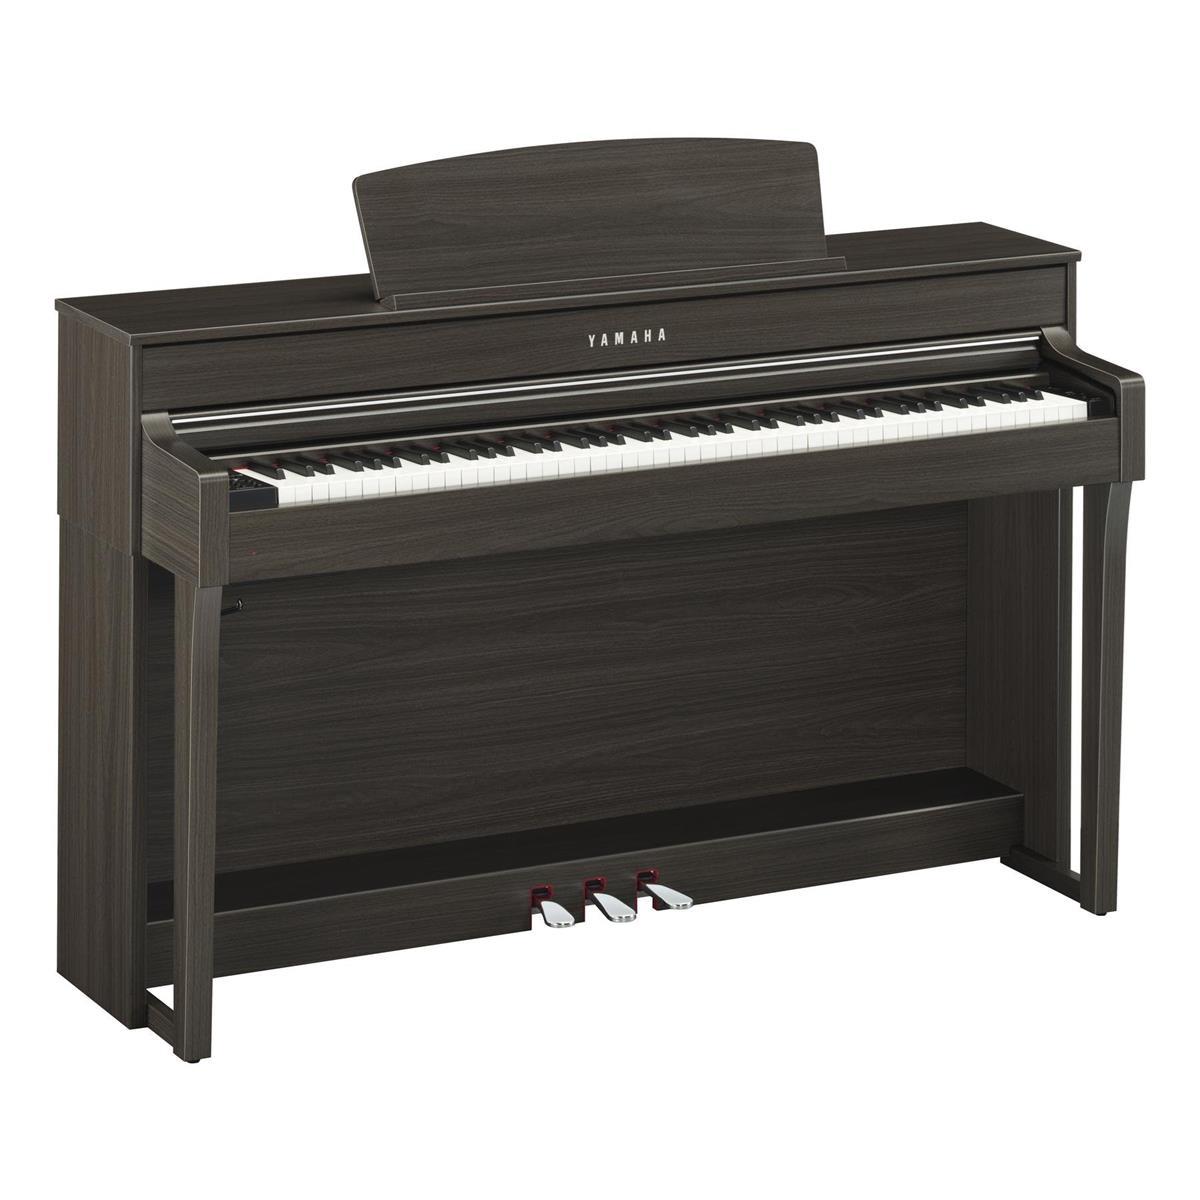 YAMAHA CLP645WAIT - CLAVINOVA - DIGITAL PIANO OM IT